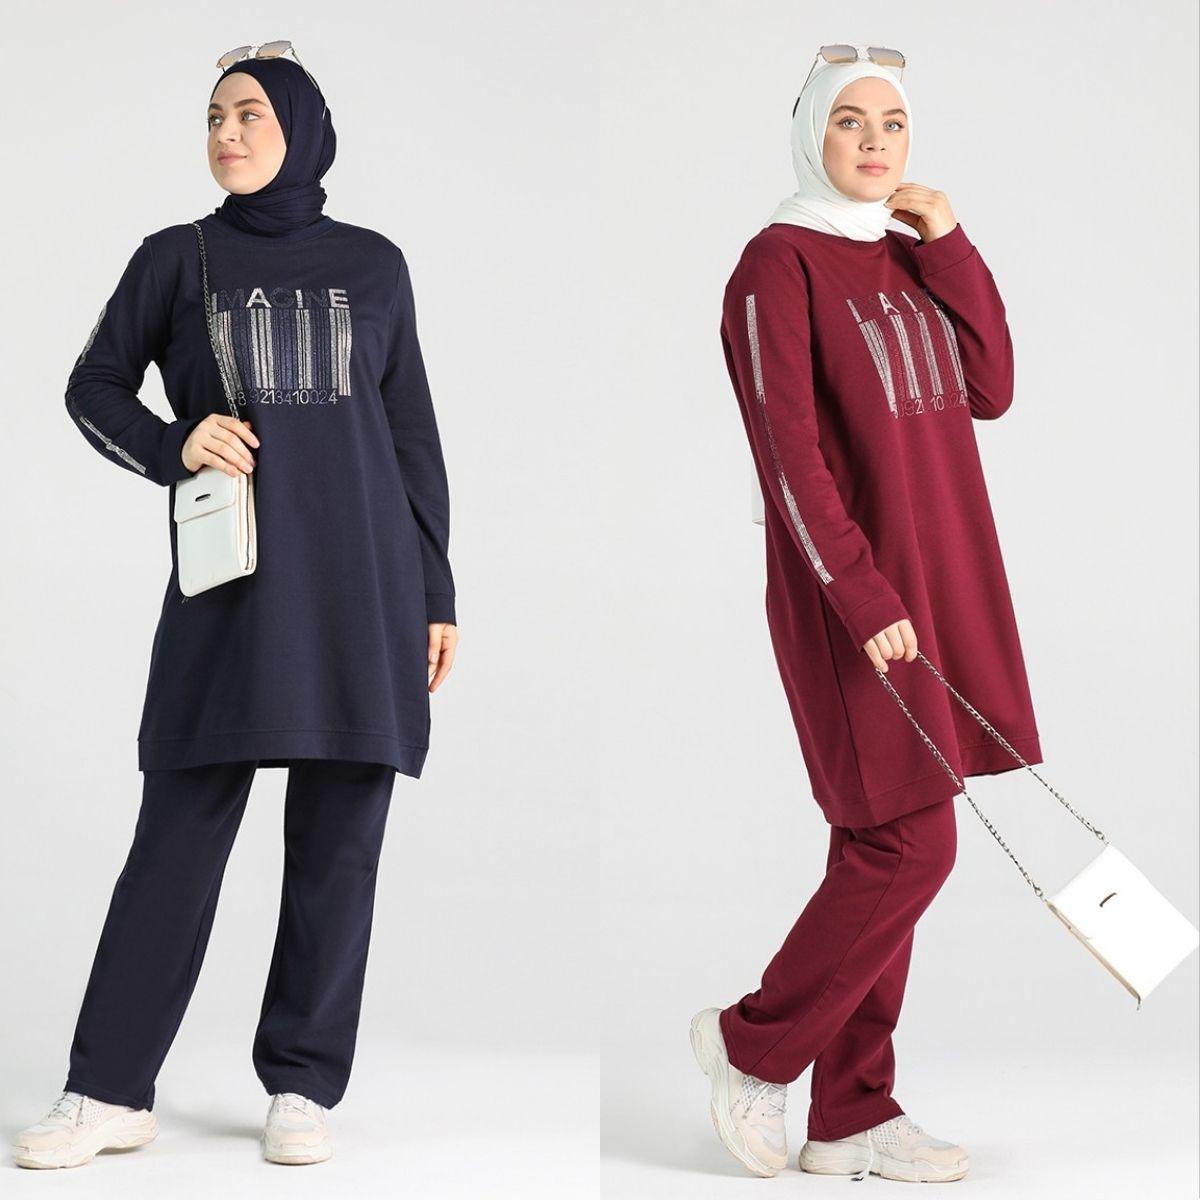 Large Size Stone Printed Tracksuits Flat Unlined Long Sleeve Zero Collar 4 Season Women Muslim Fashion Hijab Clothing Sports Use